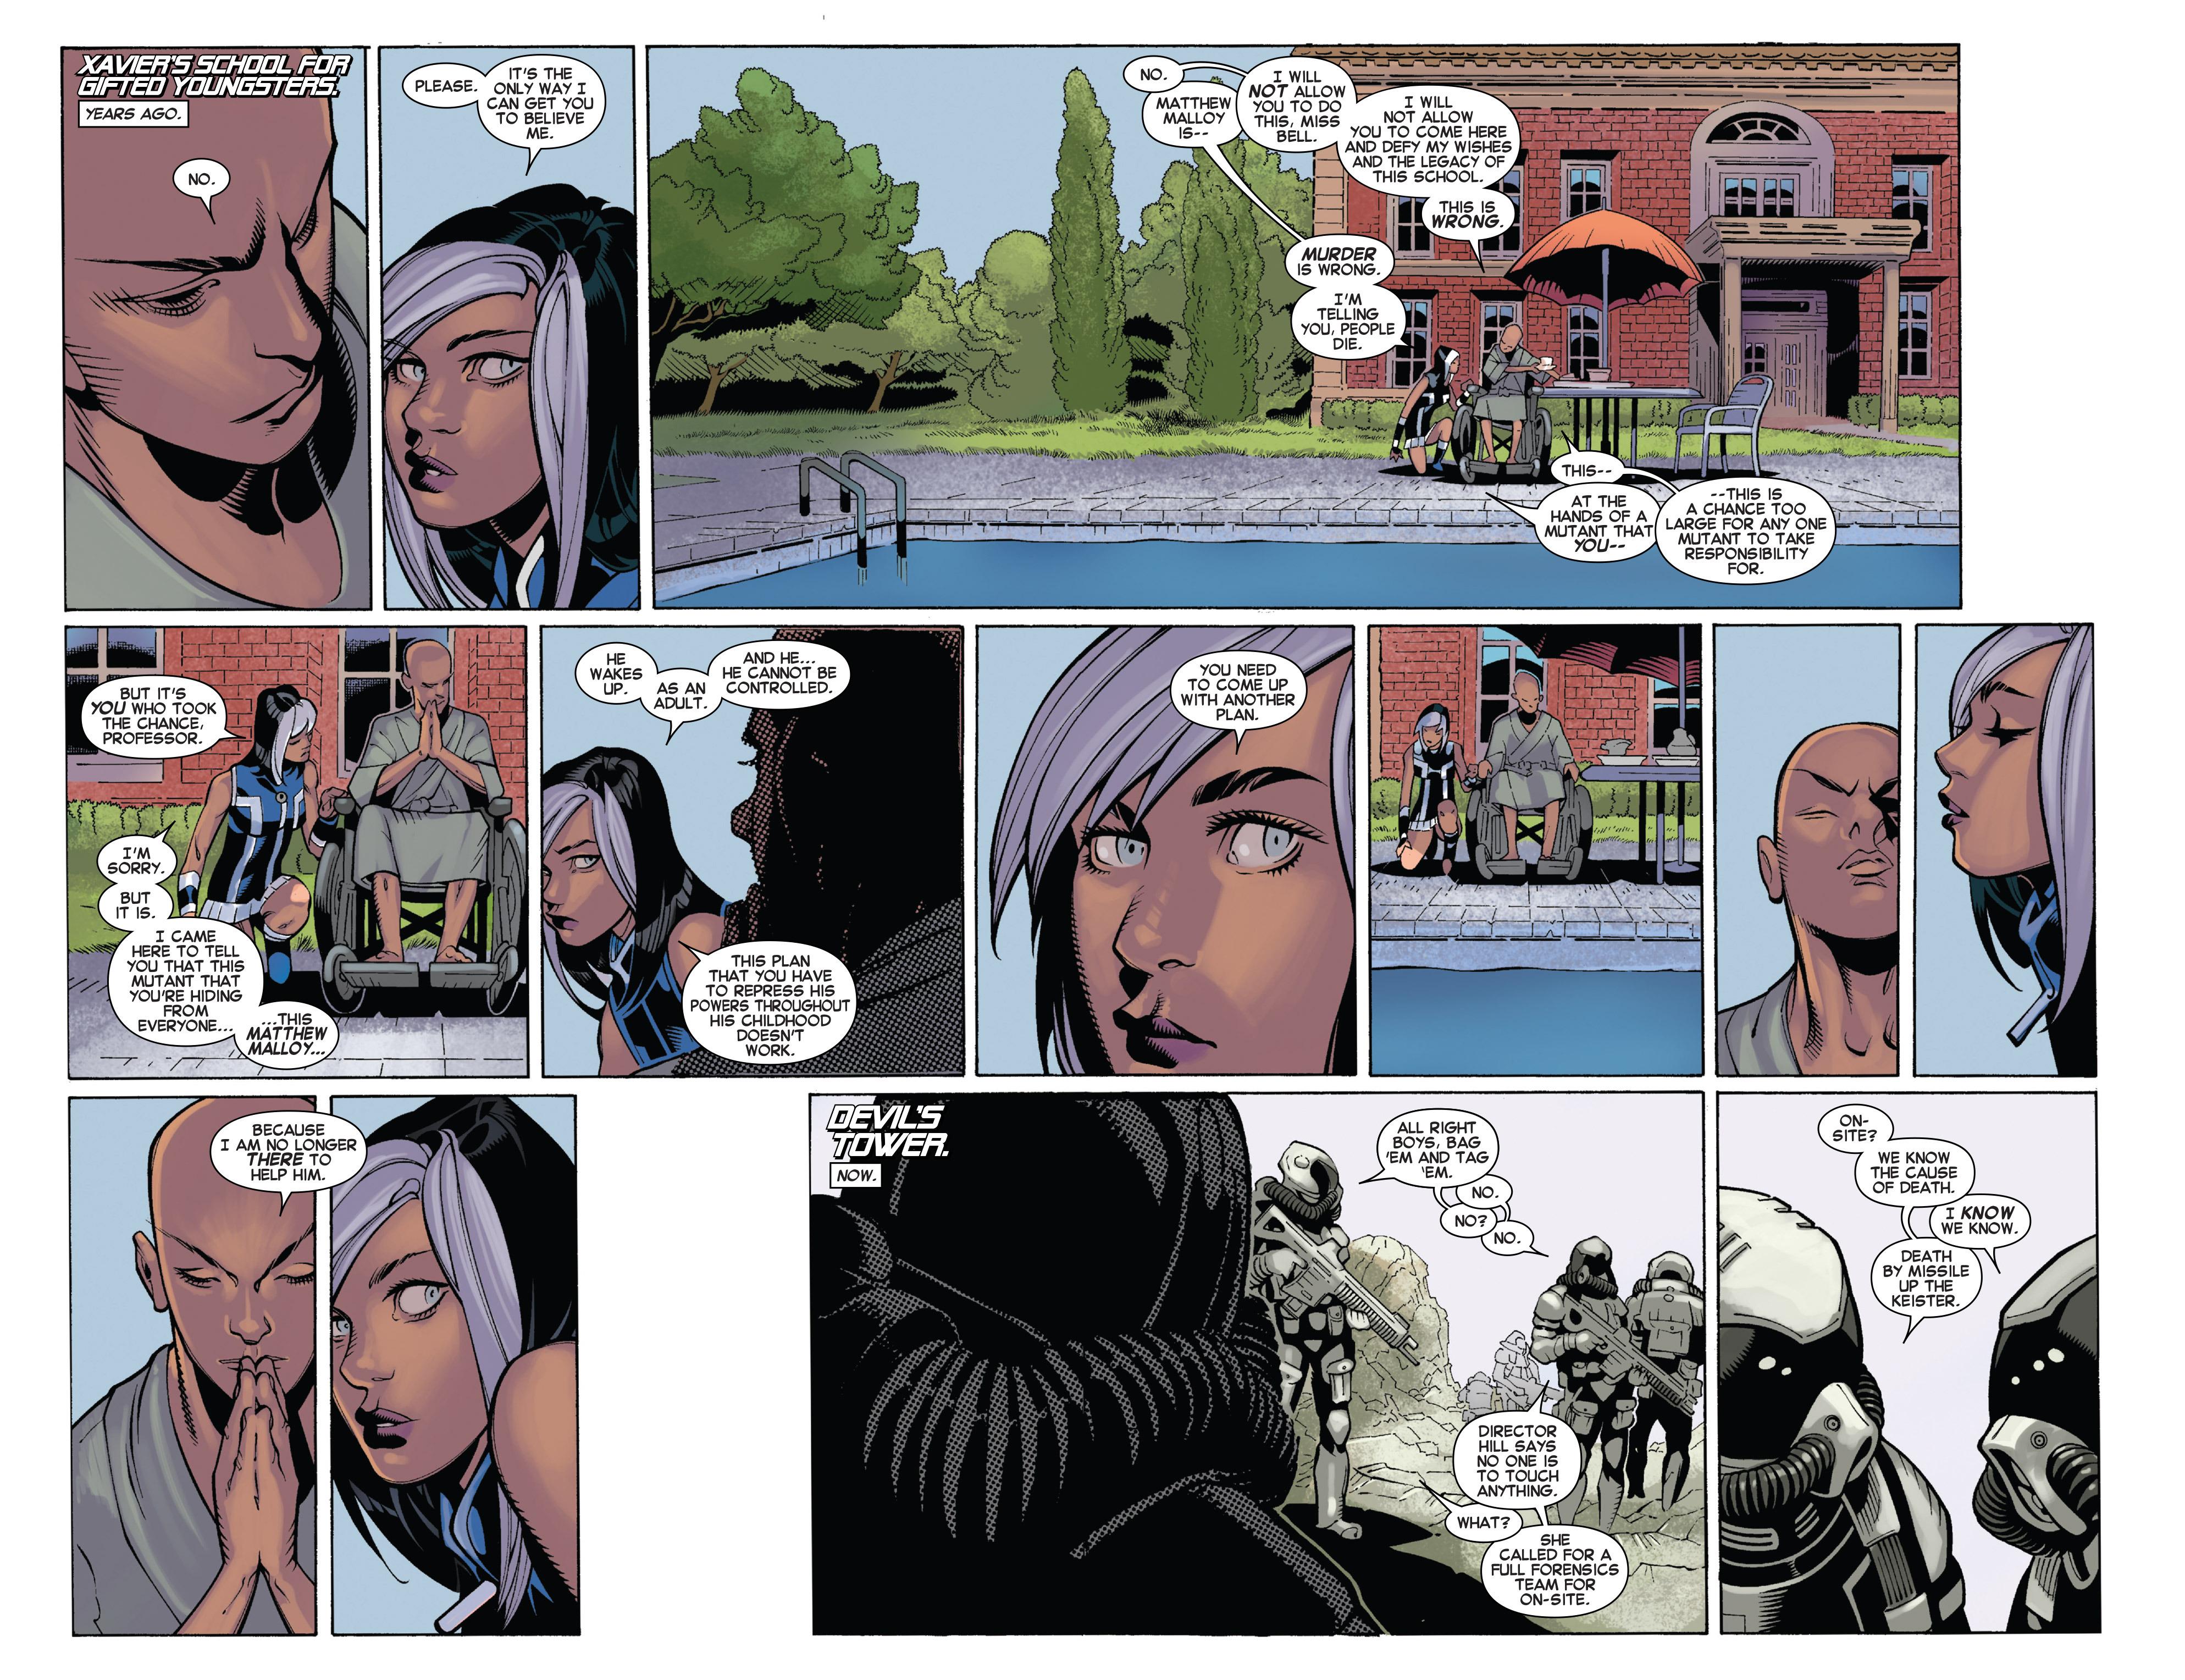 Read online Uncanny X-Men (2013) comic -  Issue # _TPB 5 - The Omega Mutant - 83